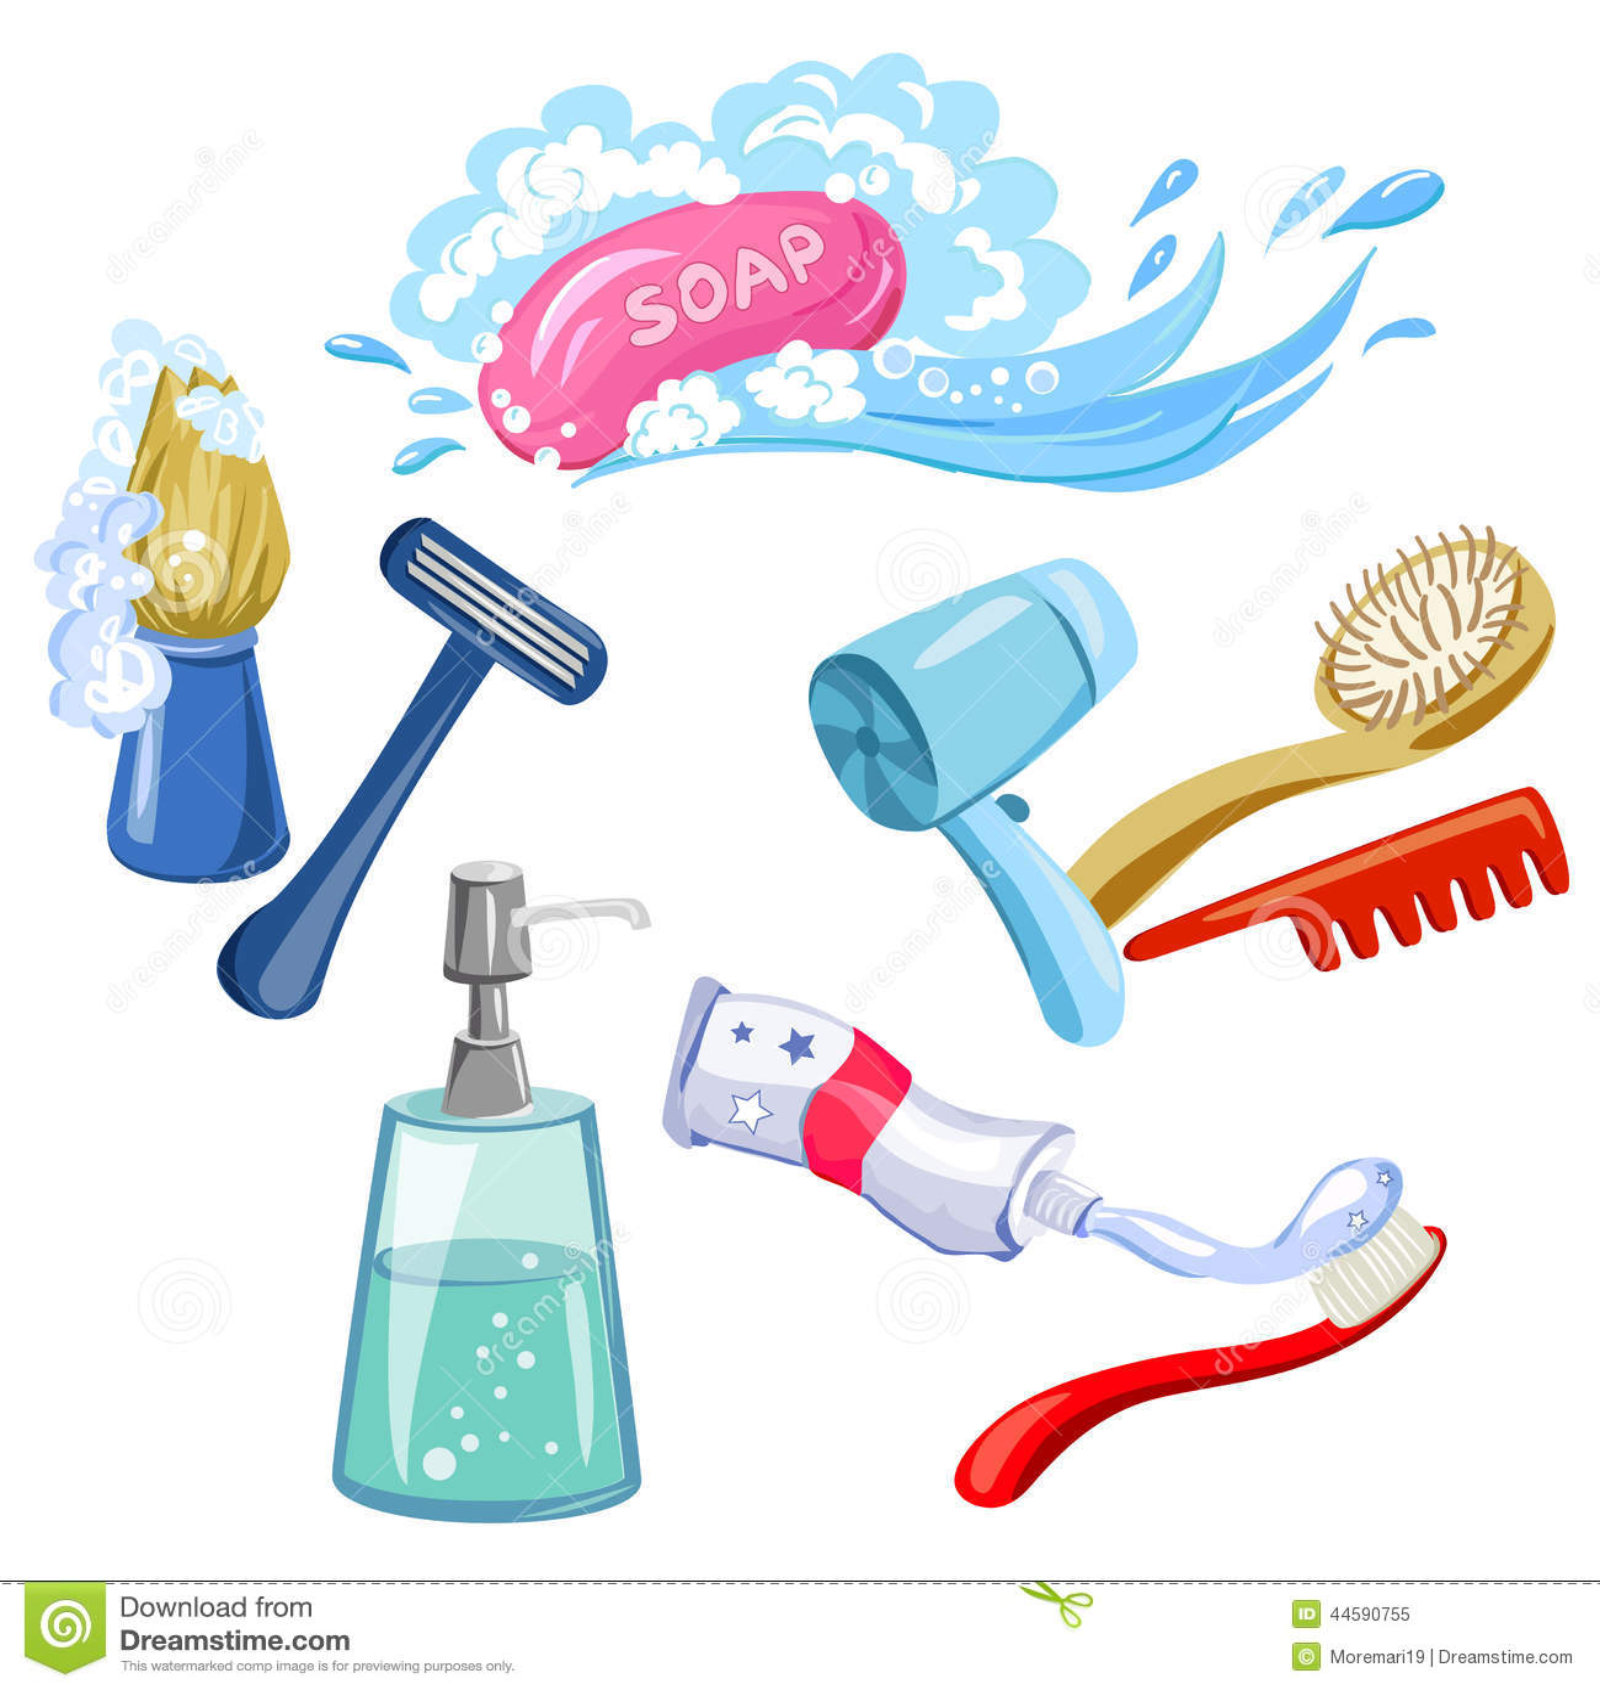 Hygien personlig omsorg, objekt